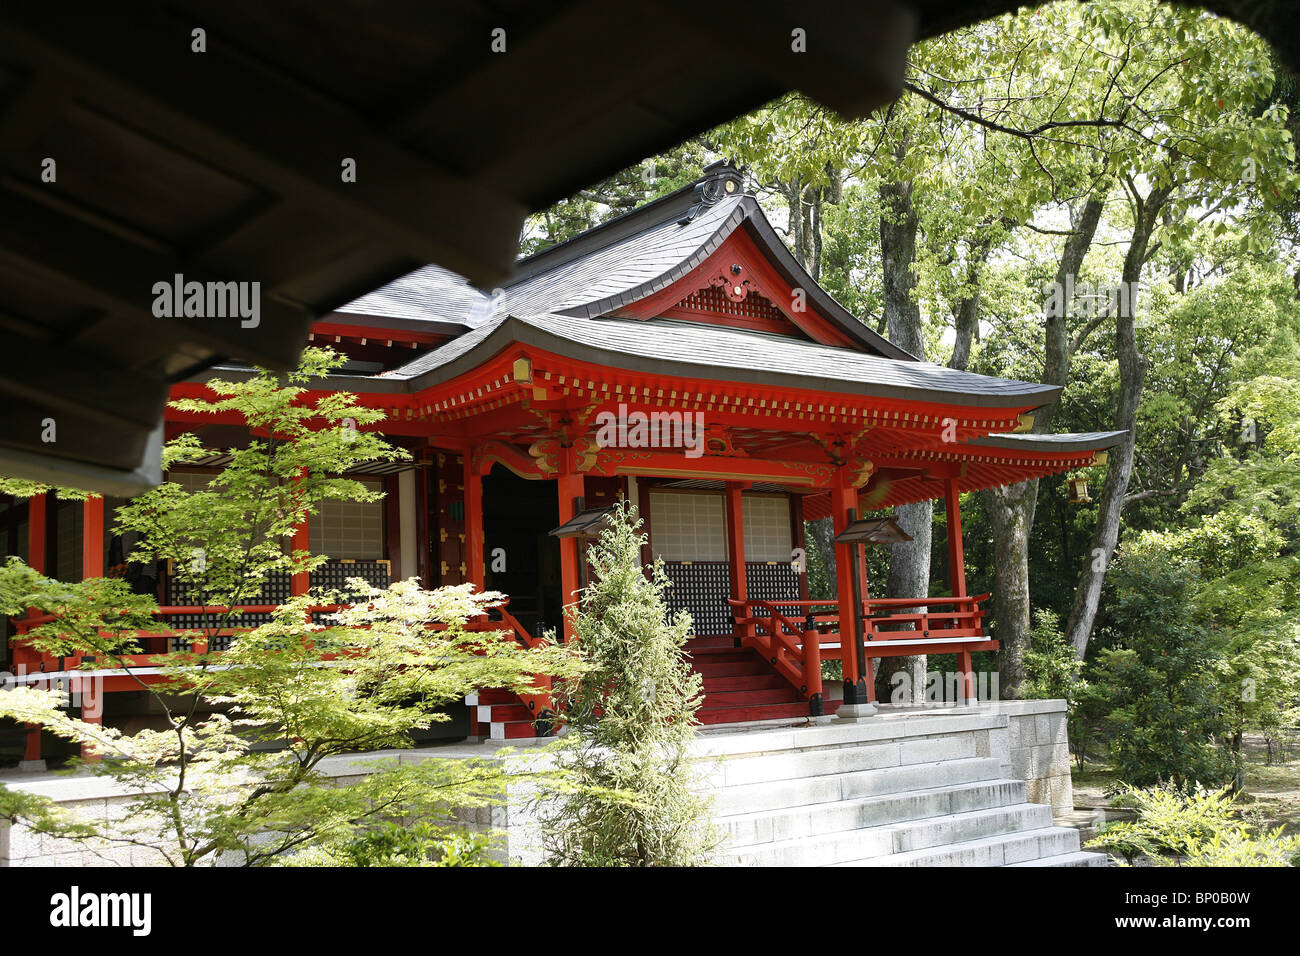 JAPON, KYOTO, Daikakuji temple - Stock Image